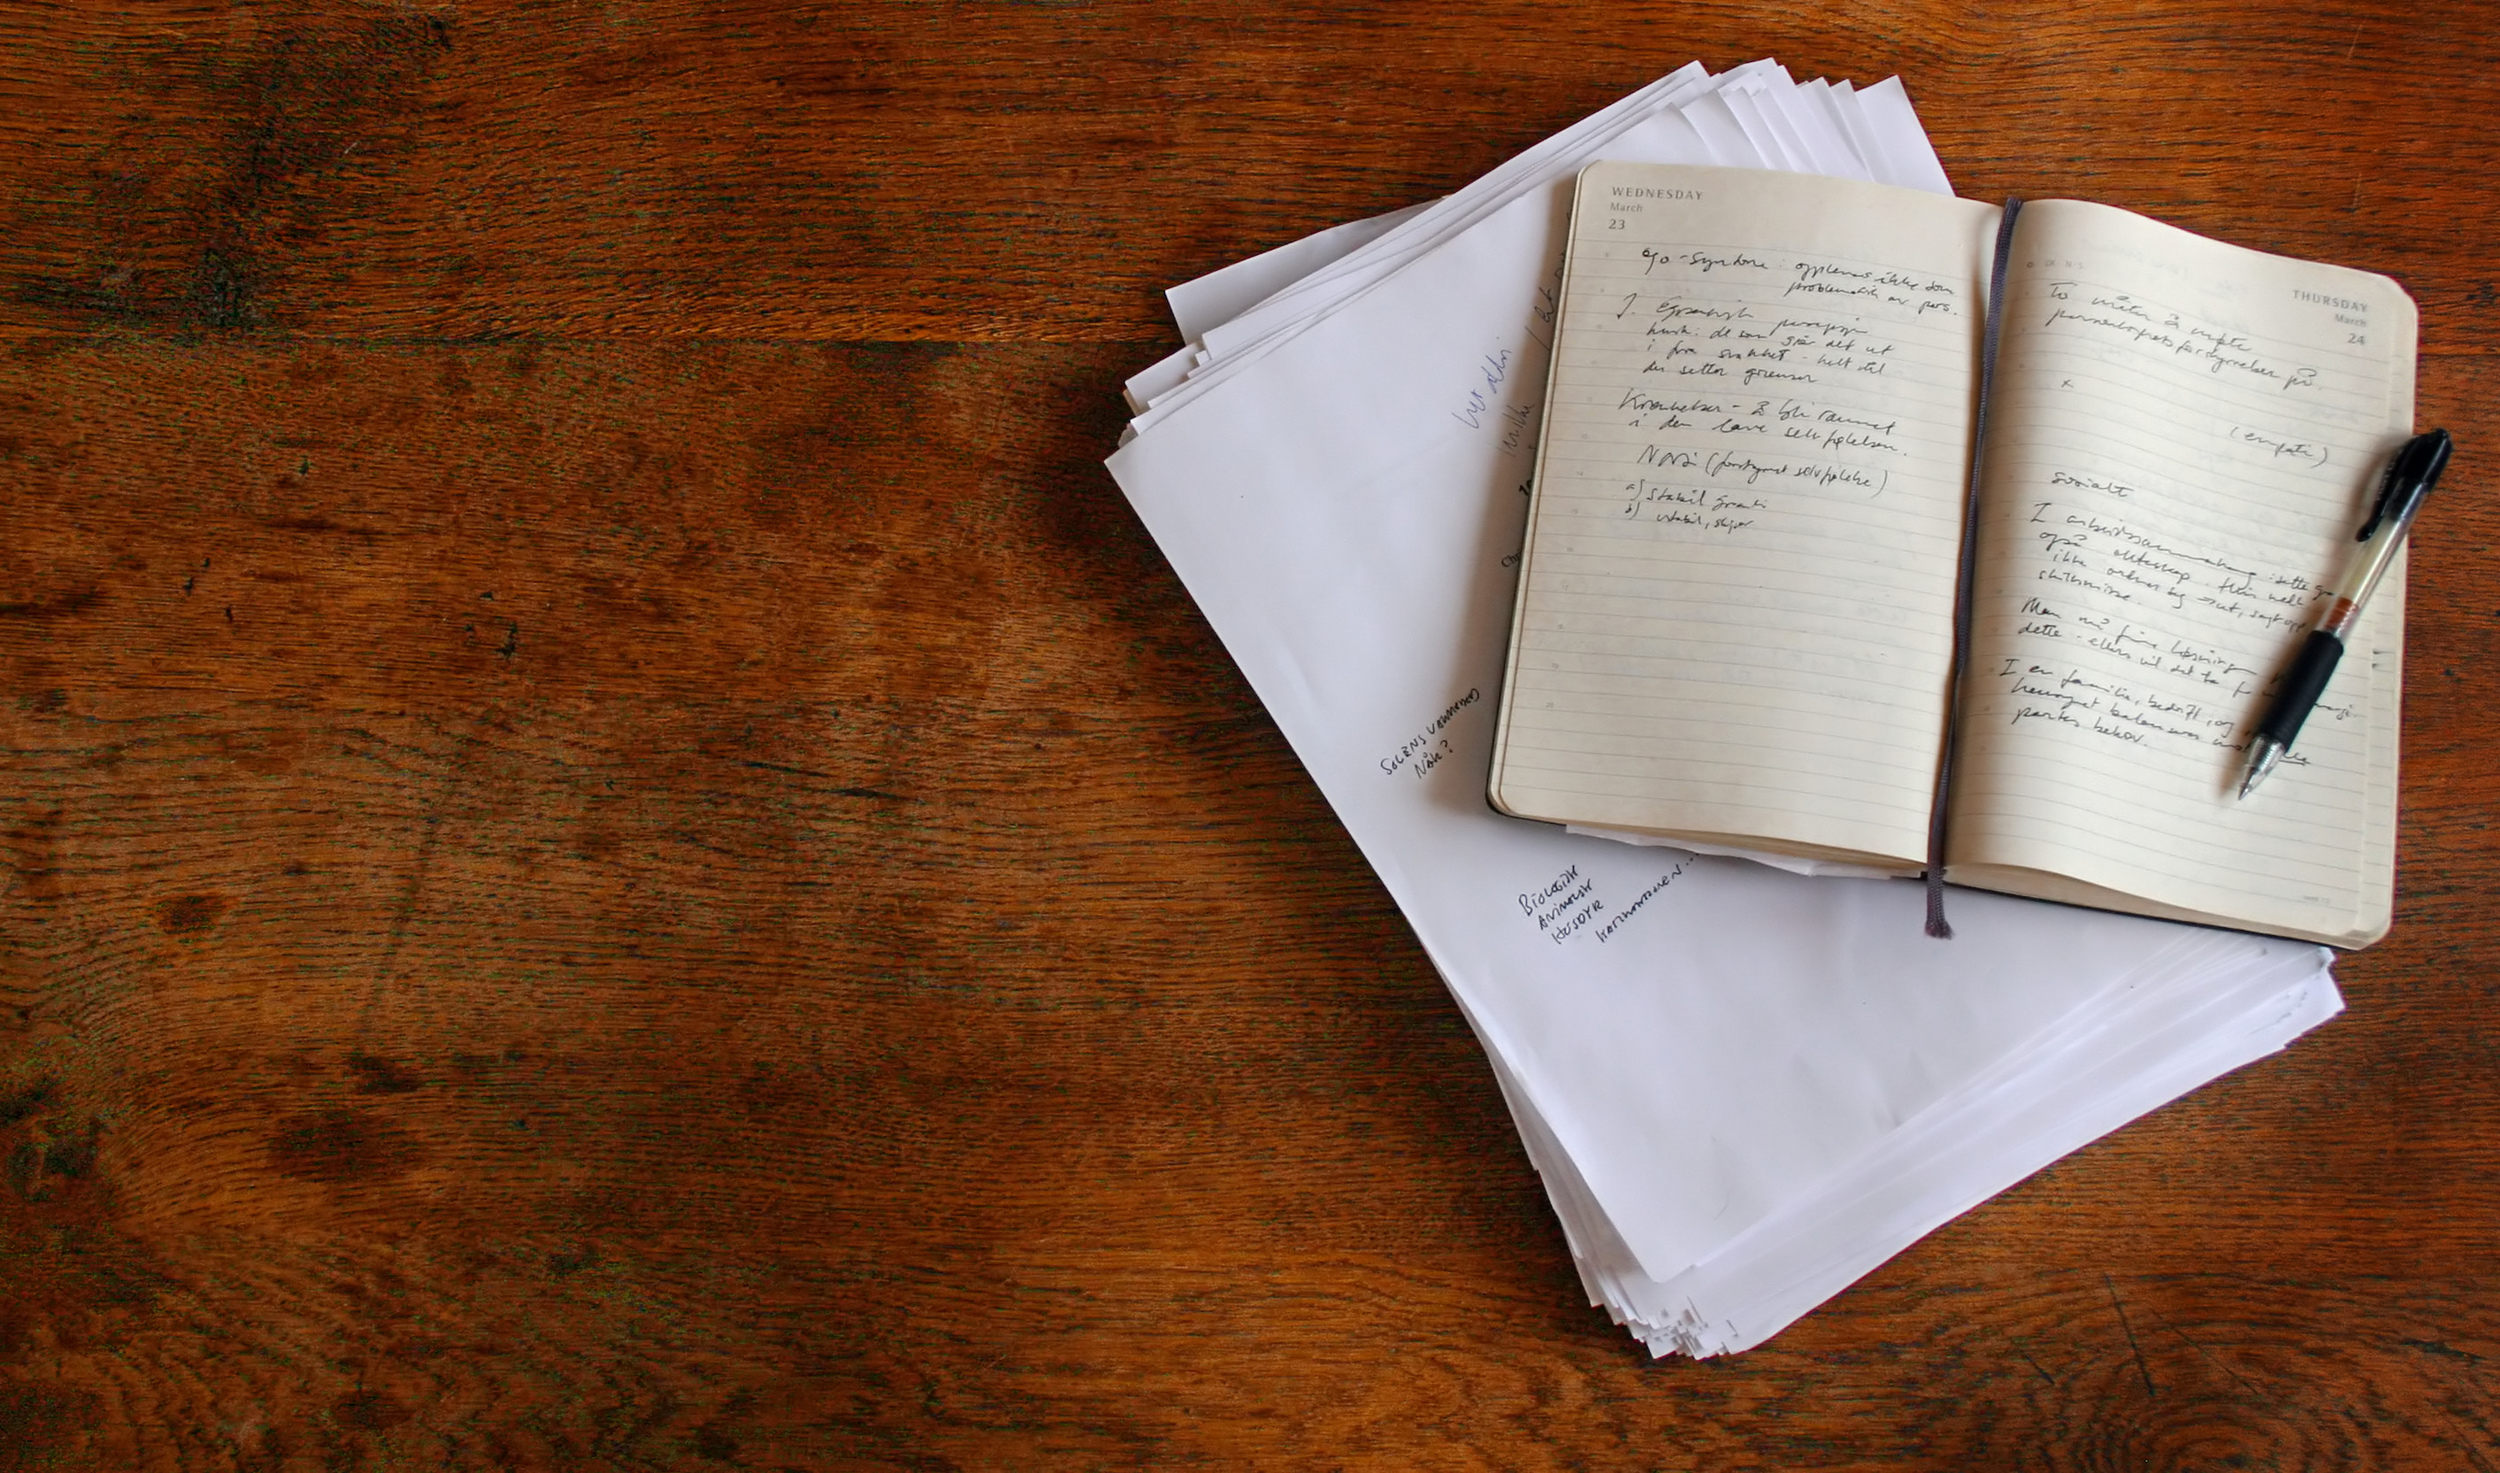 Freewriting creative writing exercise for film editors